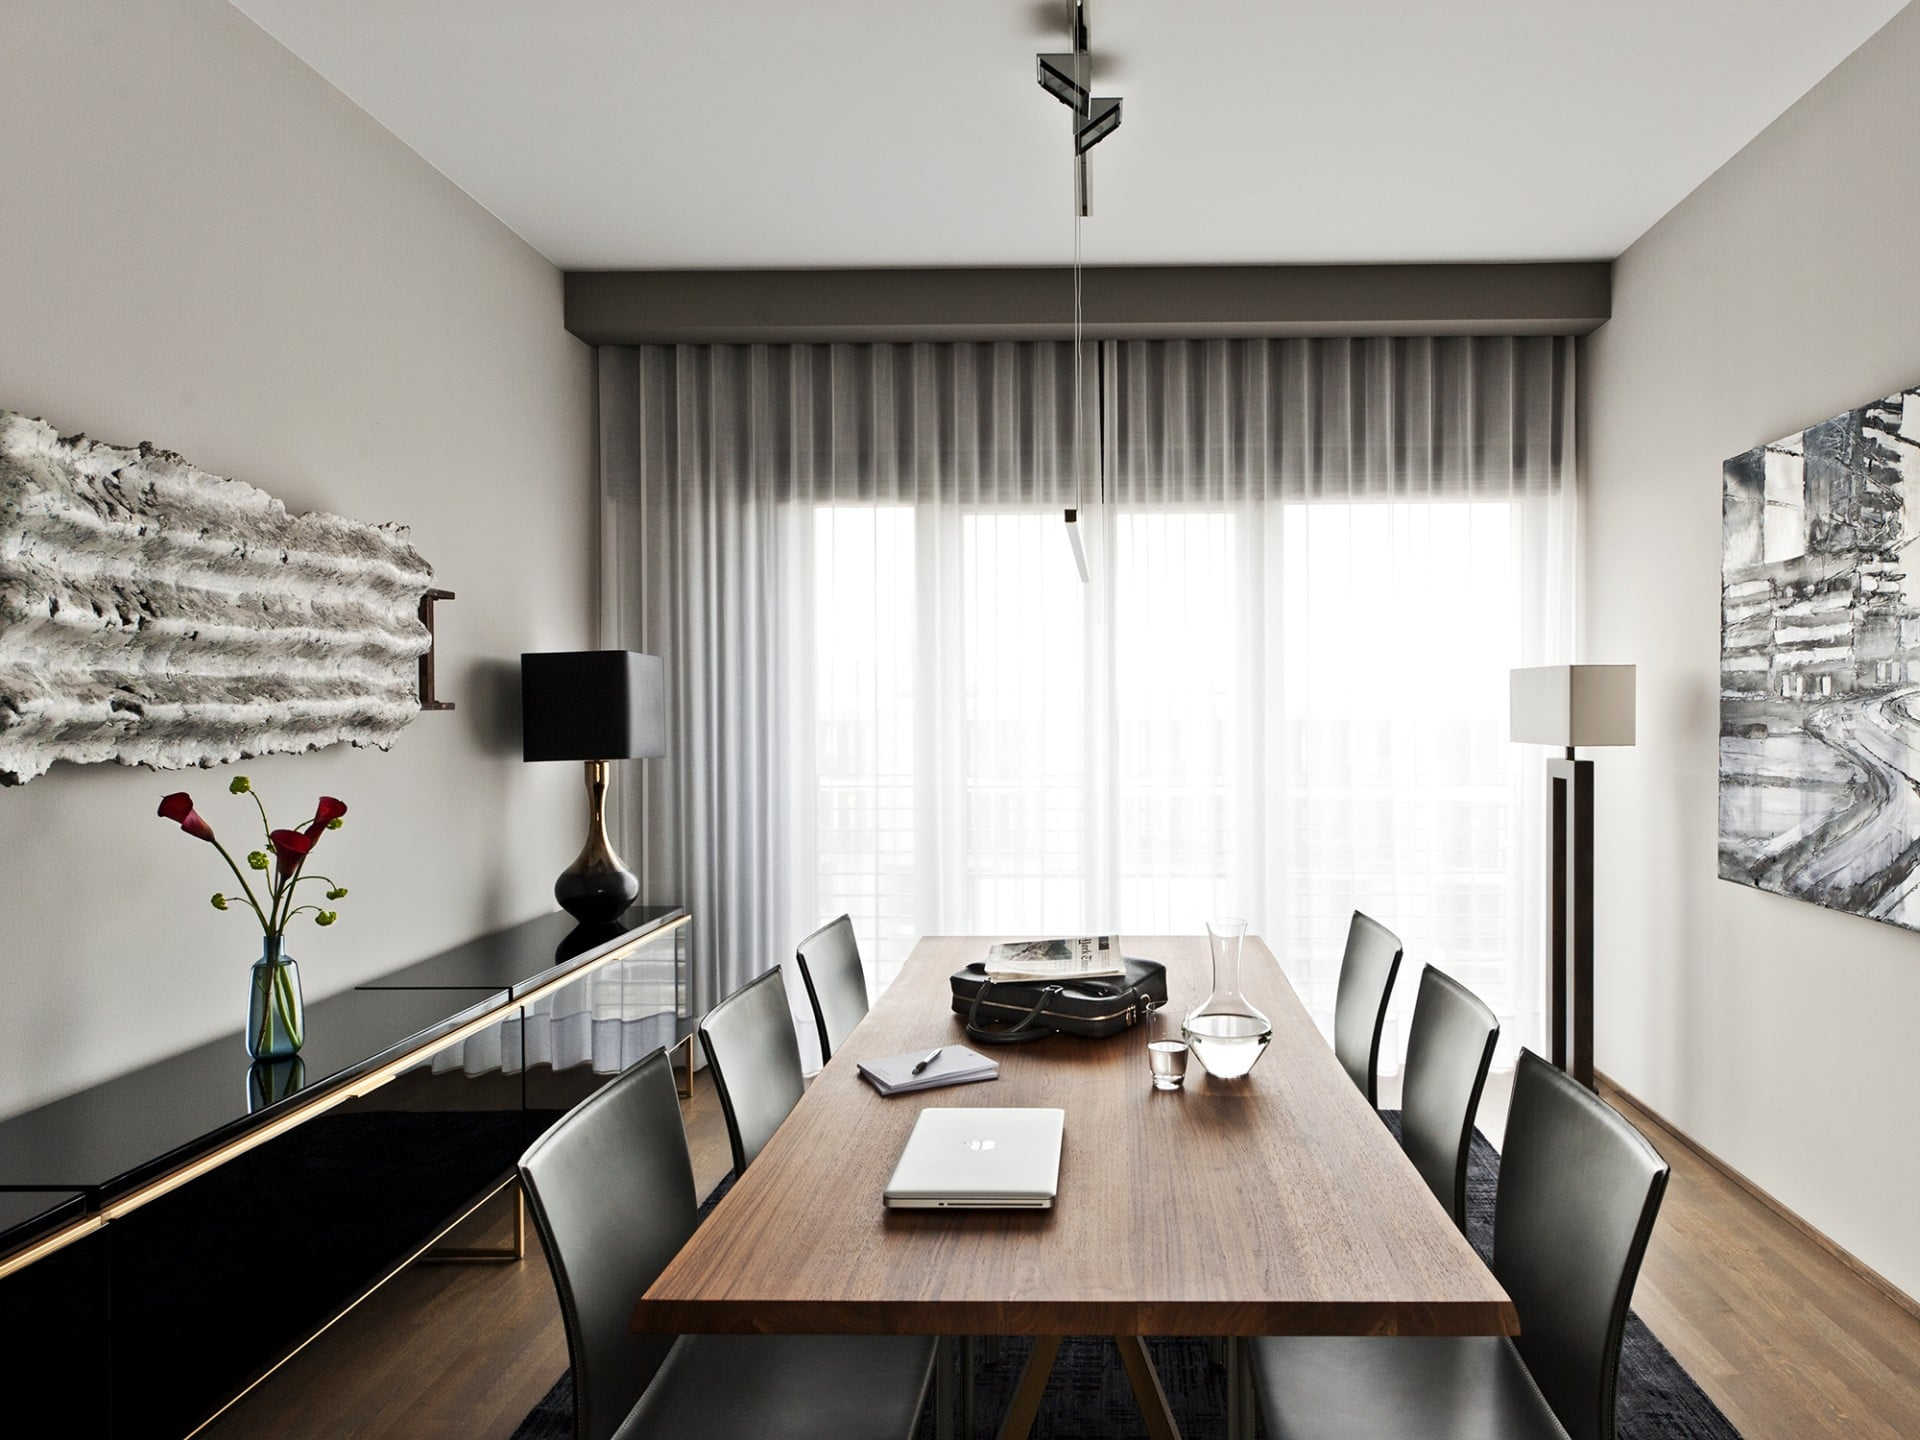 204-Sedlar-&-Wolff-Photography-Architekturfotos-HrigA8r0